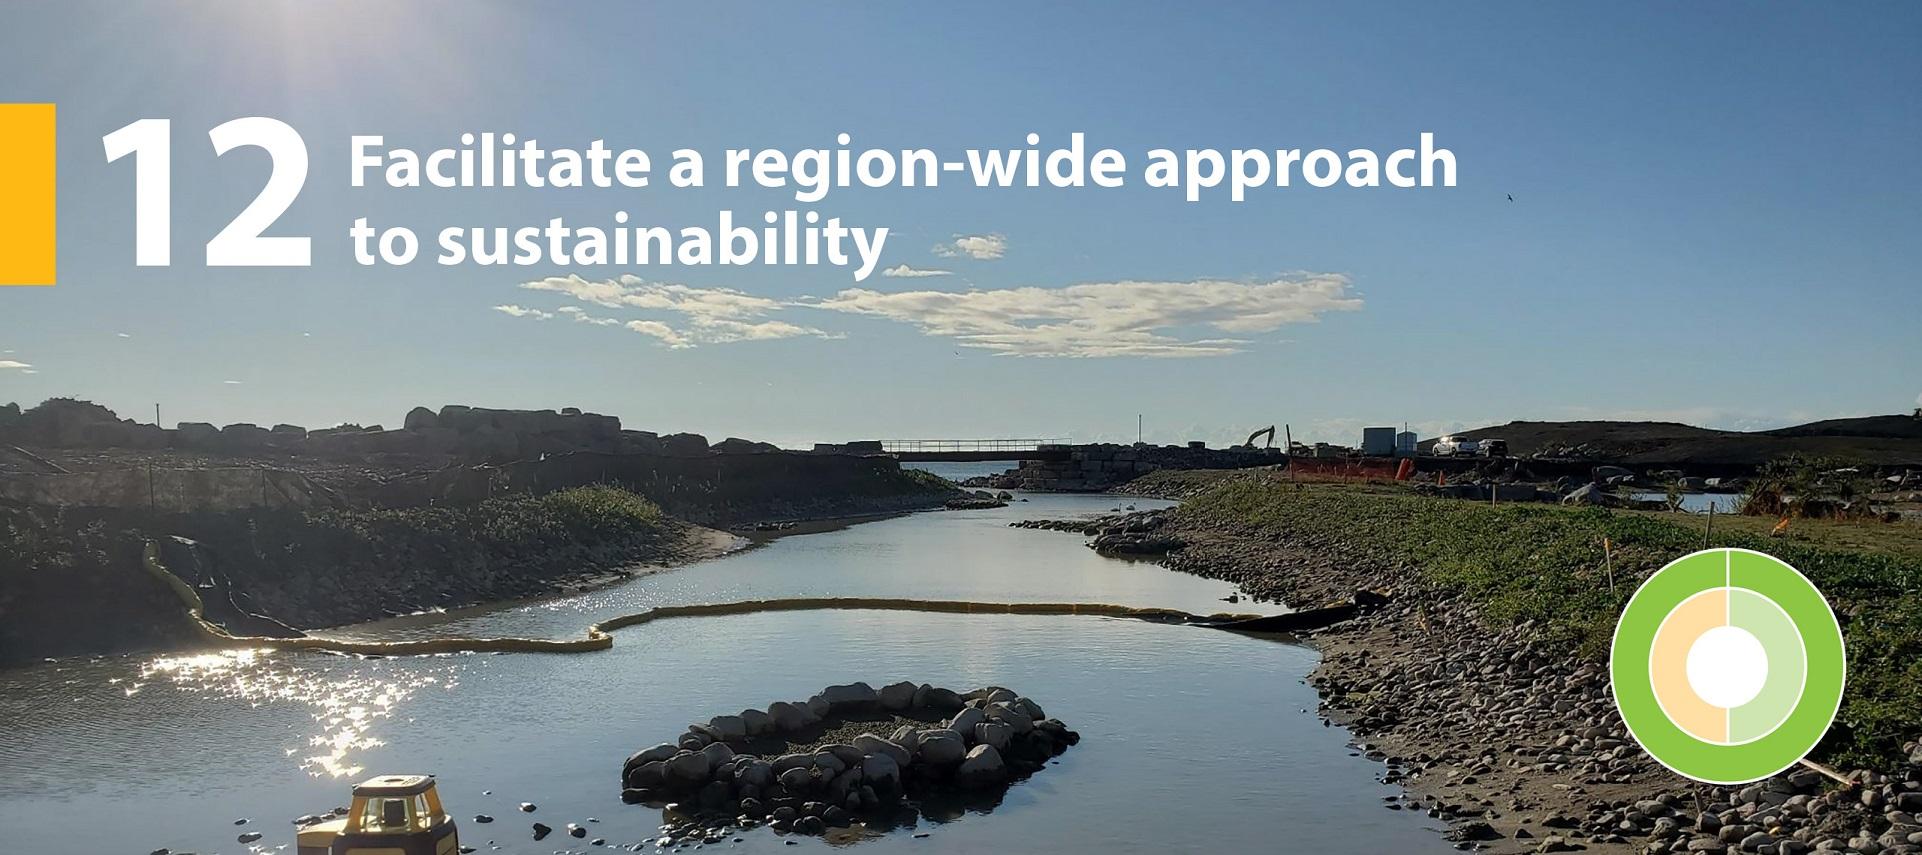 TRCA strategic goal 12 - Facilitate a region-wide approach to sustainability